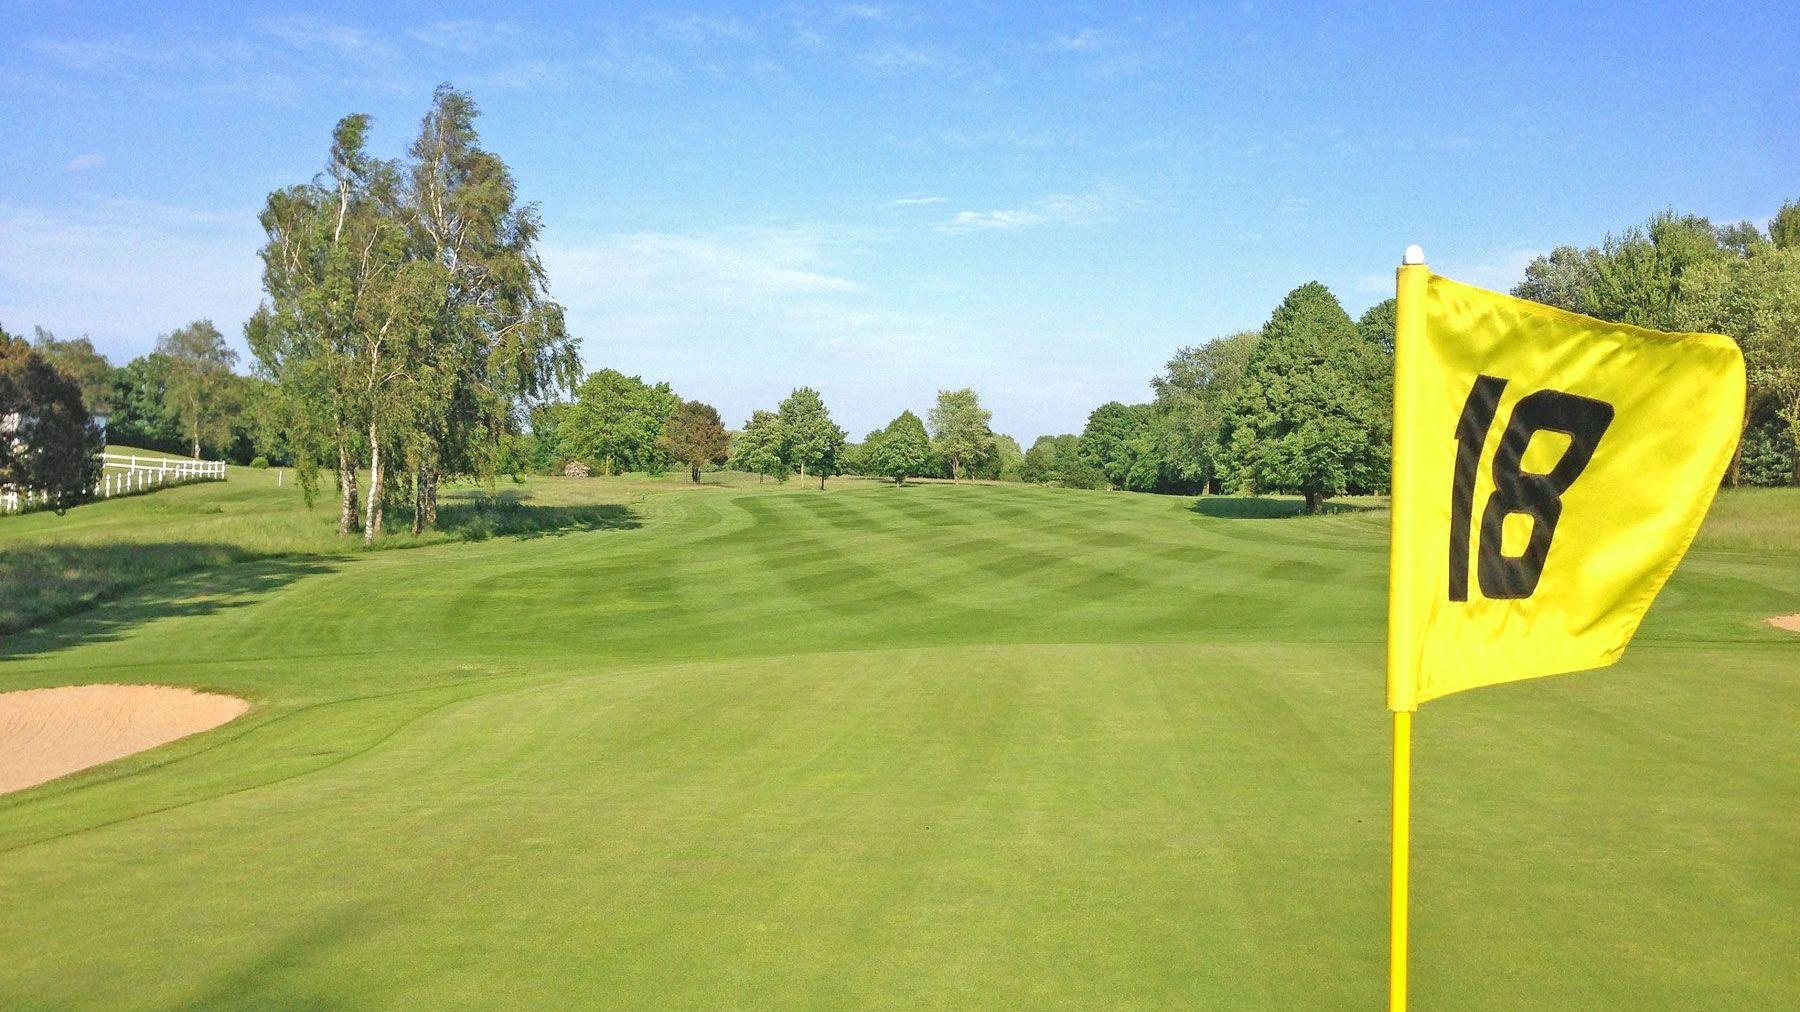 Golfplatz in Kisdorf